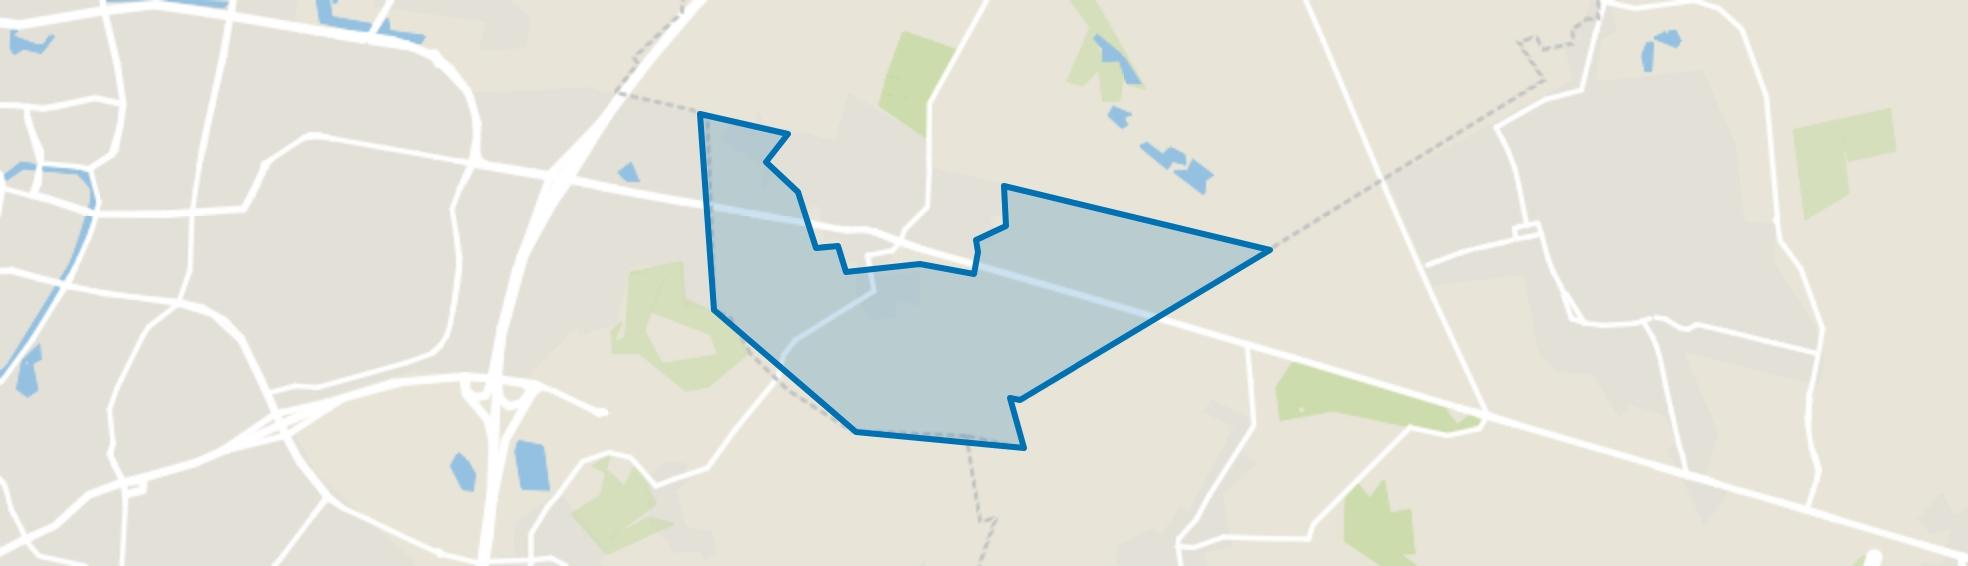 Buitengebied Dorst-Zuid, Dorst map